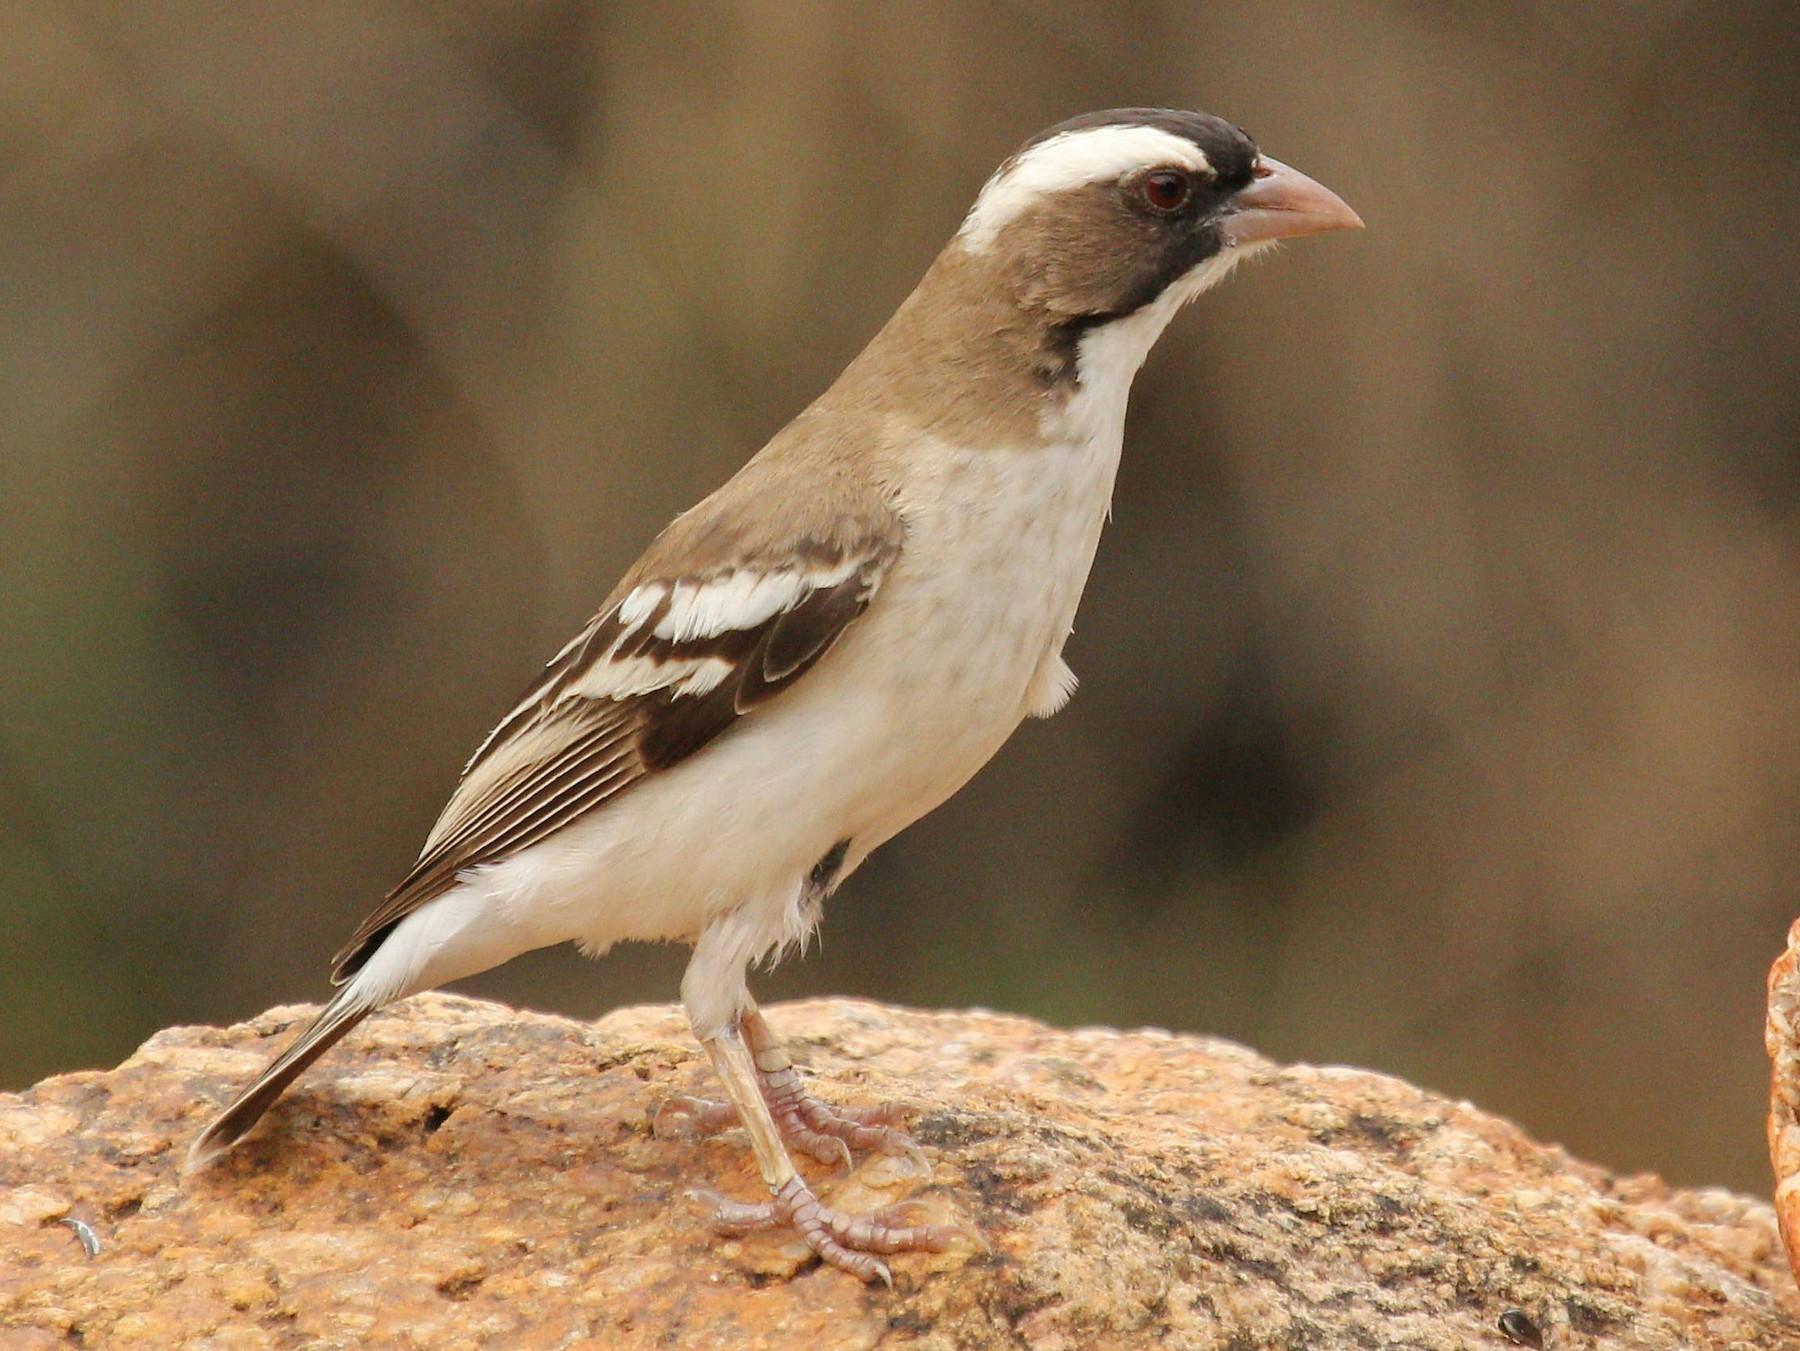 White-browed Sparrow-Weaver - Andrey Vlasenko